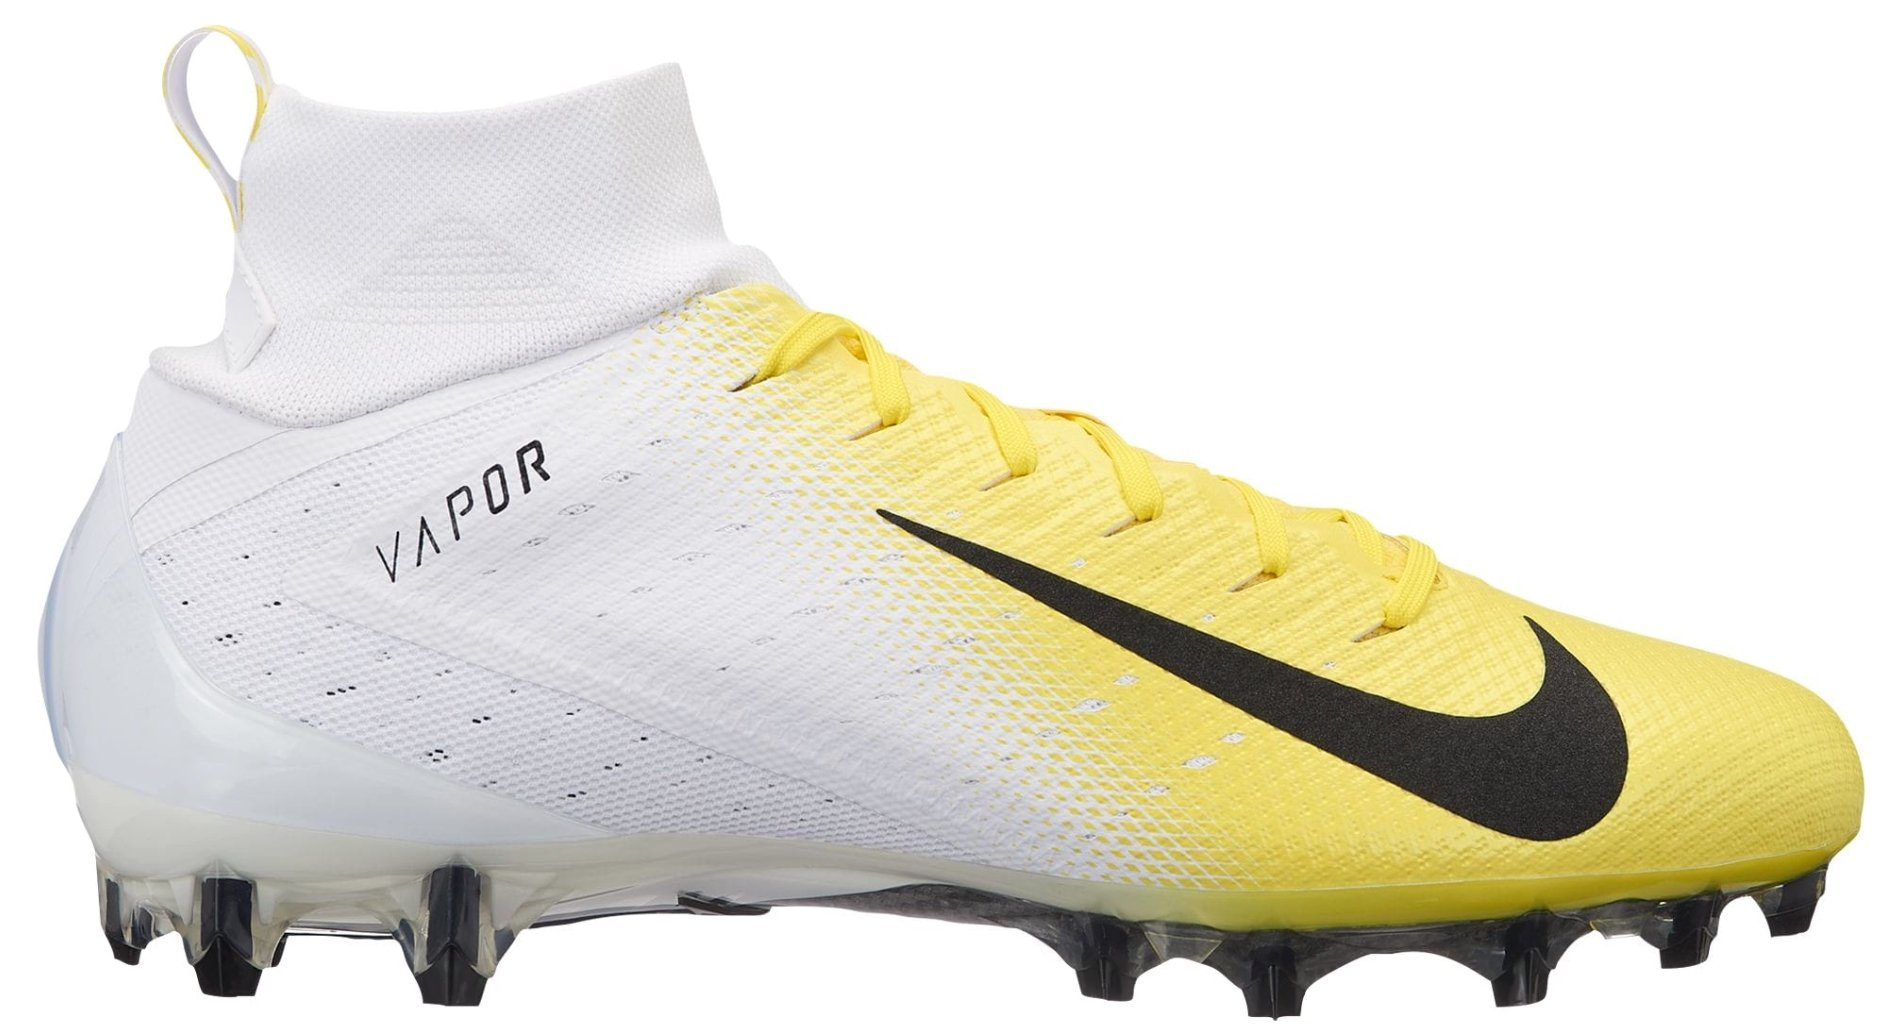 607344bbb Galleon - Nike Men's Vapor Untouchable 3 Pro Football Cleats (12,  White/Yellow)